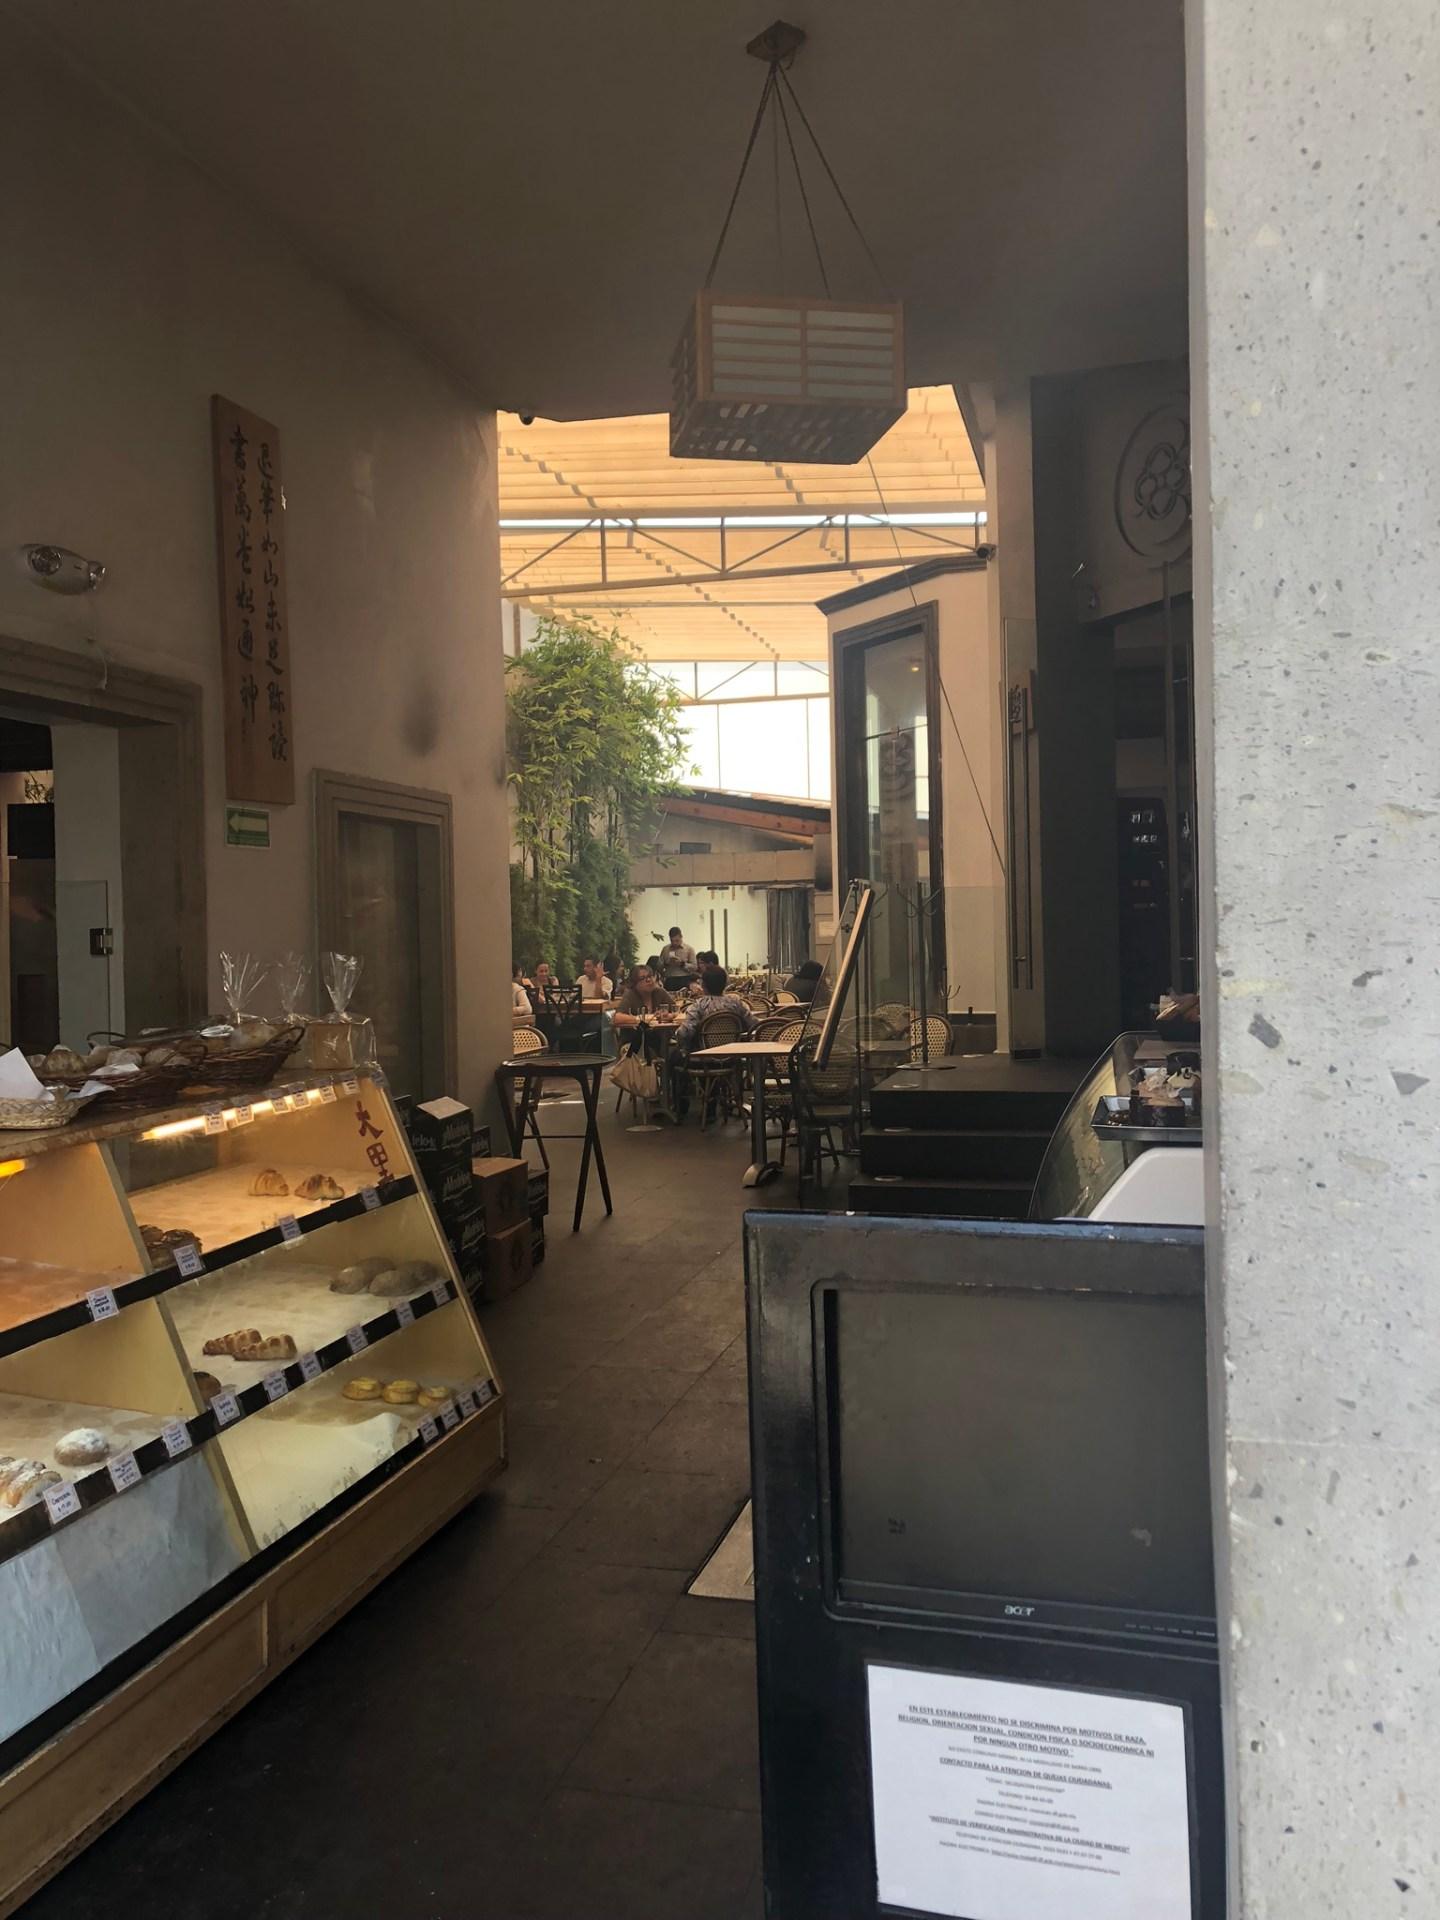 Cafe in Coyoacan, Mexico City